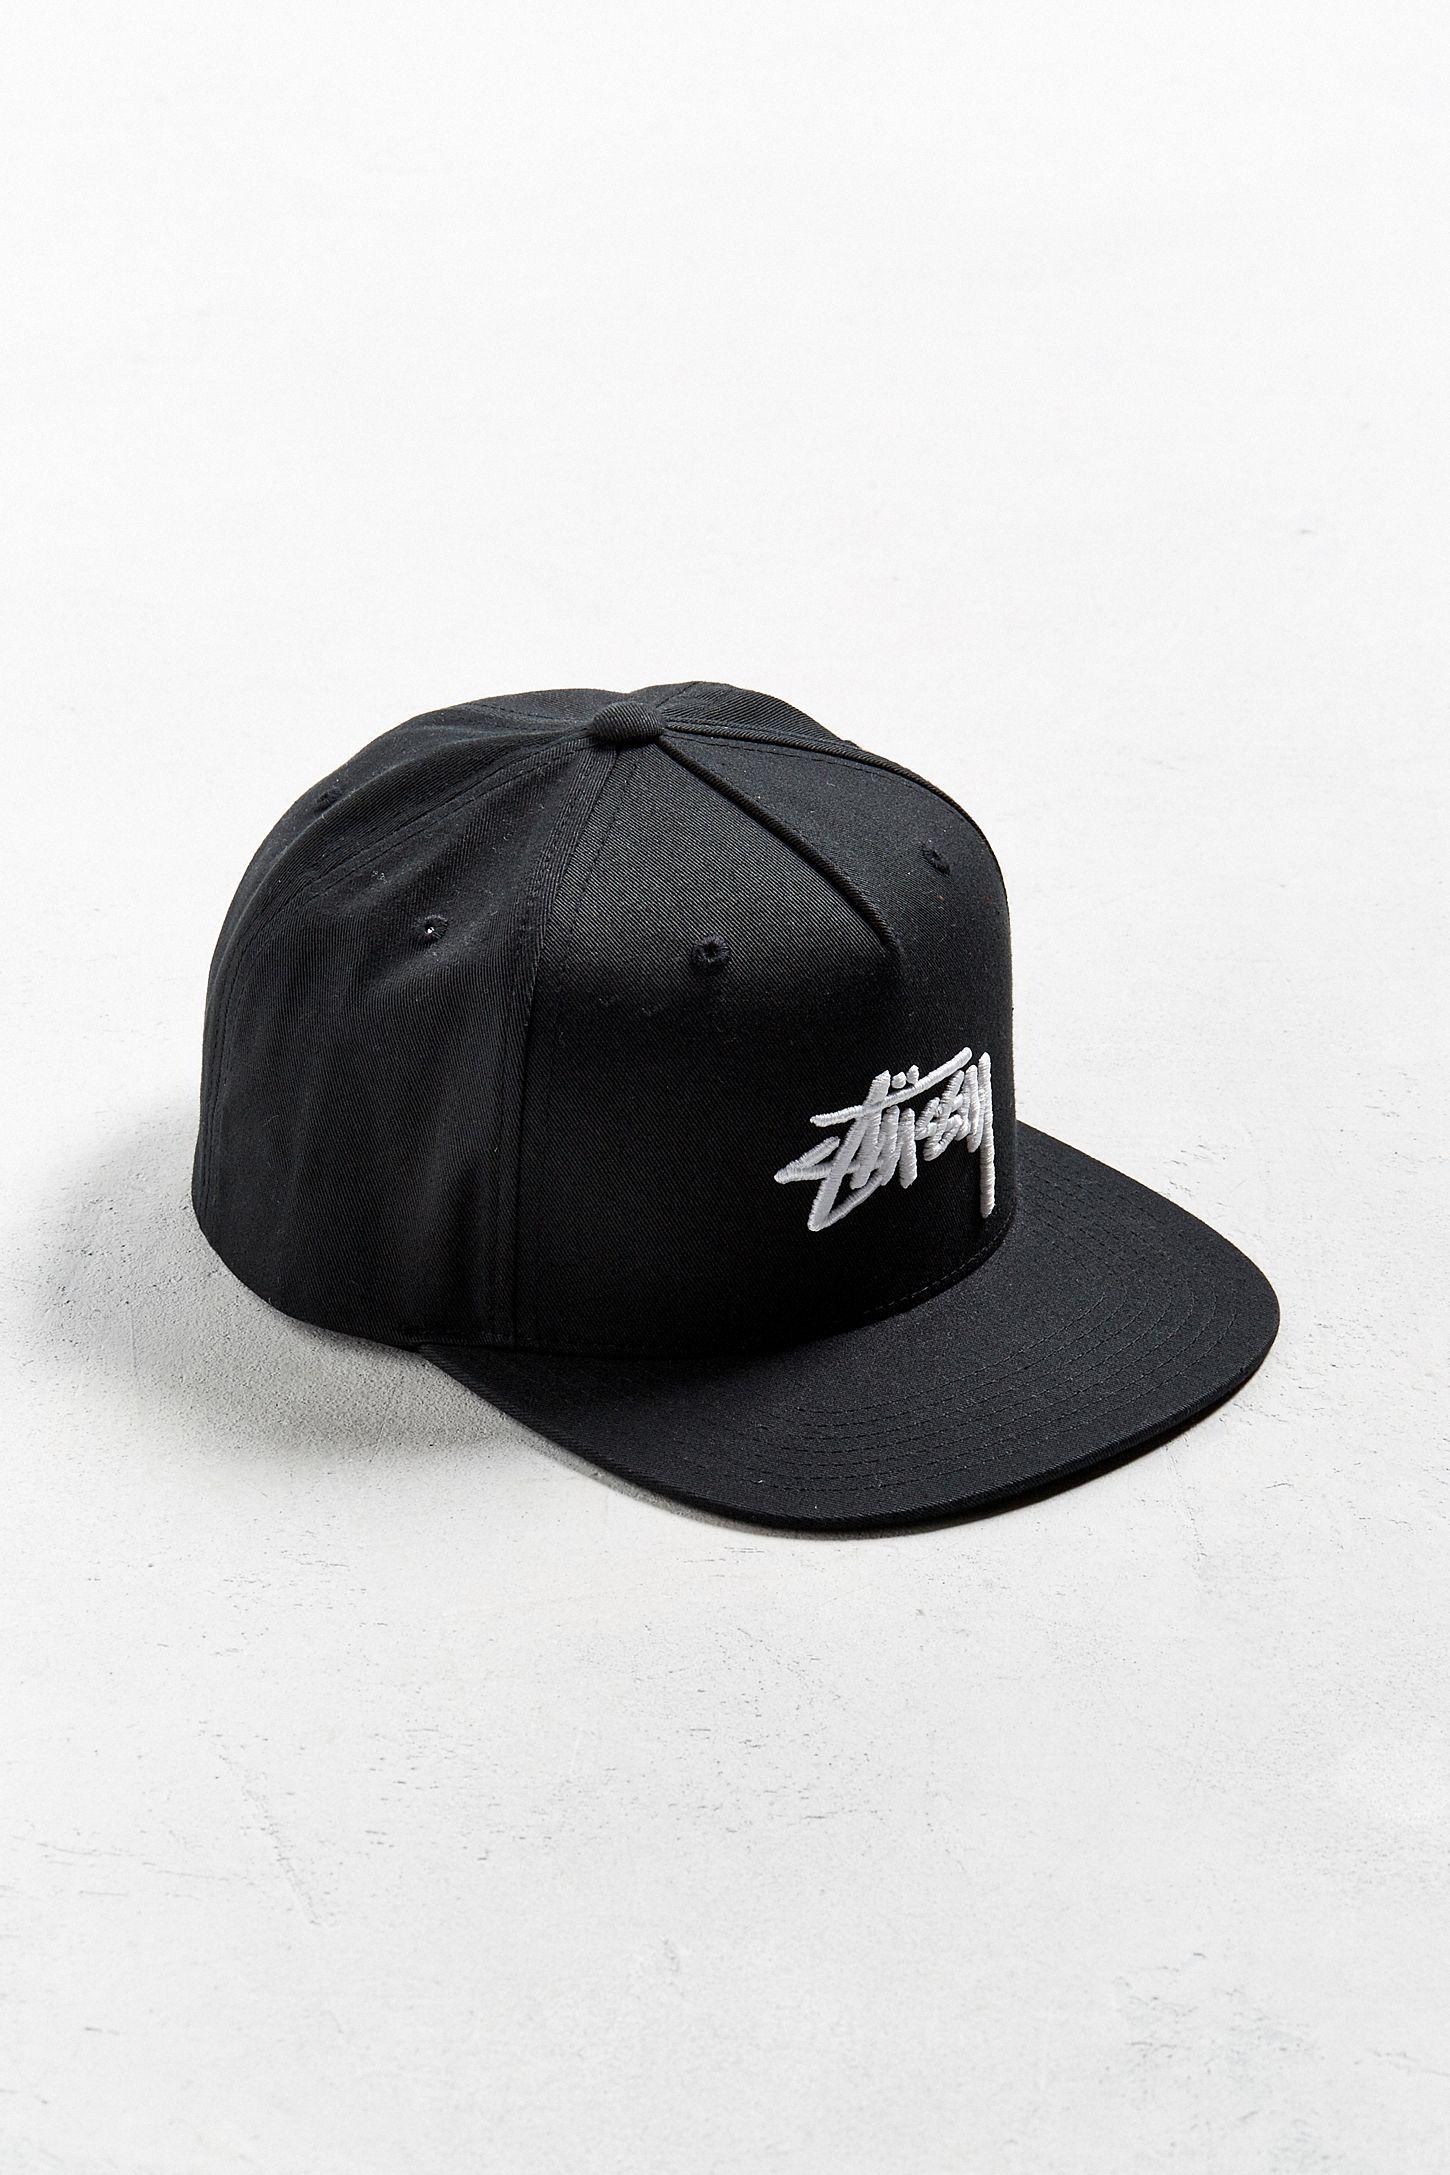 Stussy Snapback Hat  befa4844f49